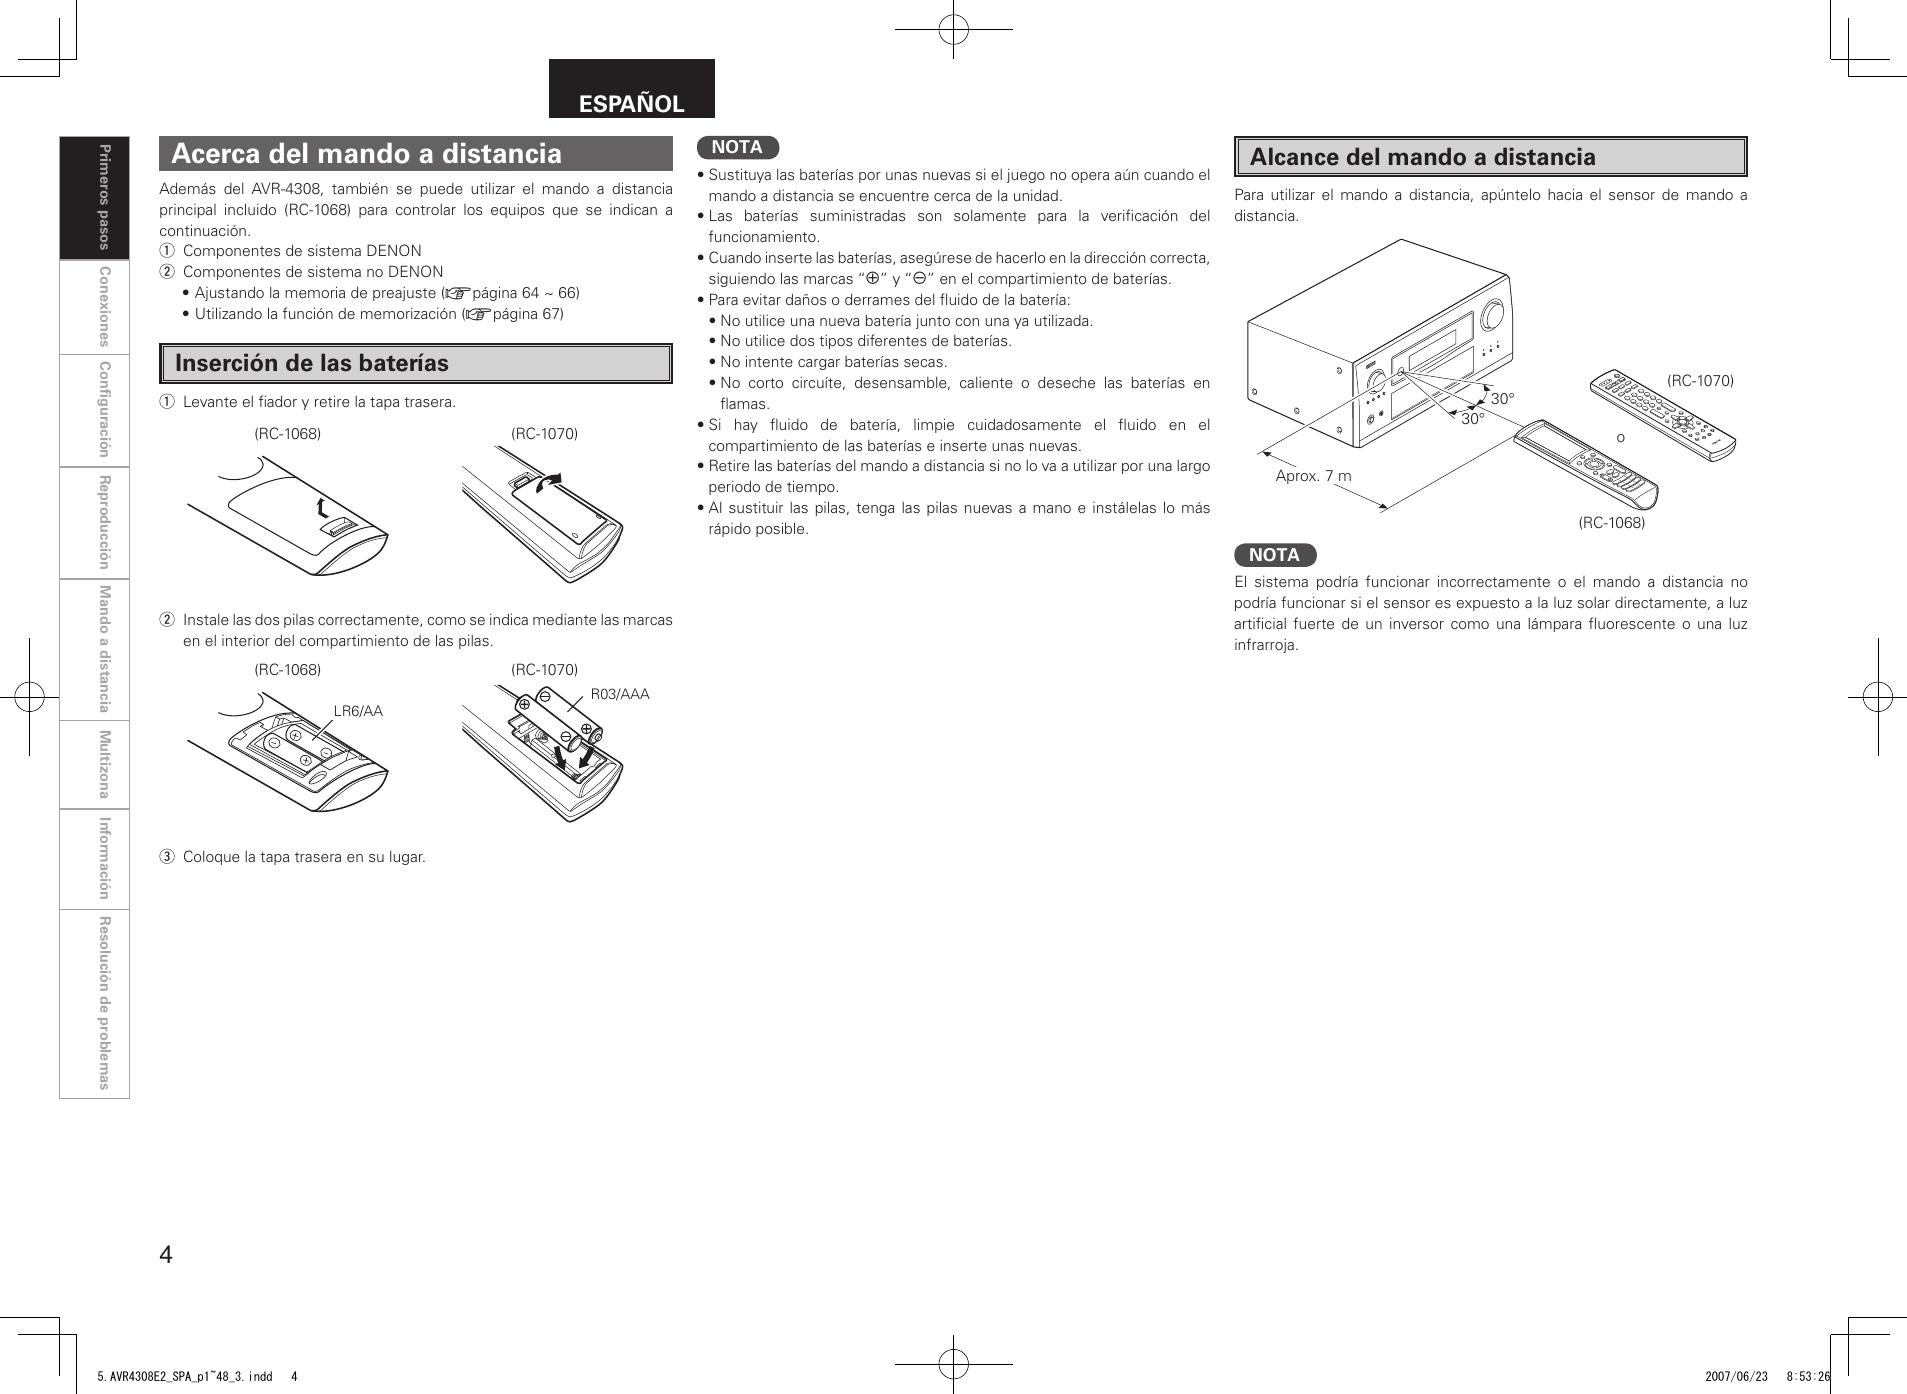 Denon Avr 4308 Users Manual 5.AVR4308E2_SPA_p1~48_3 on